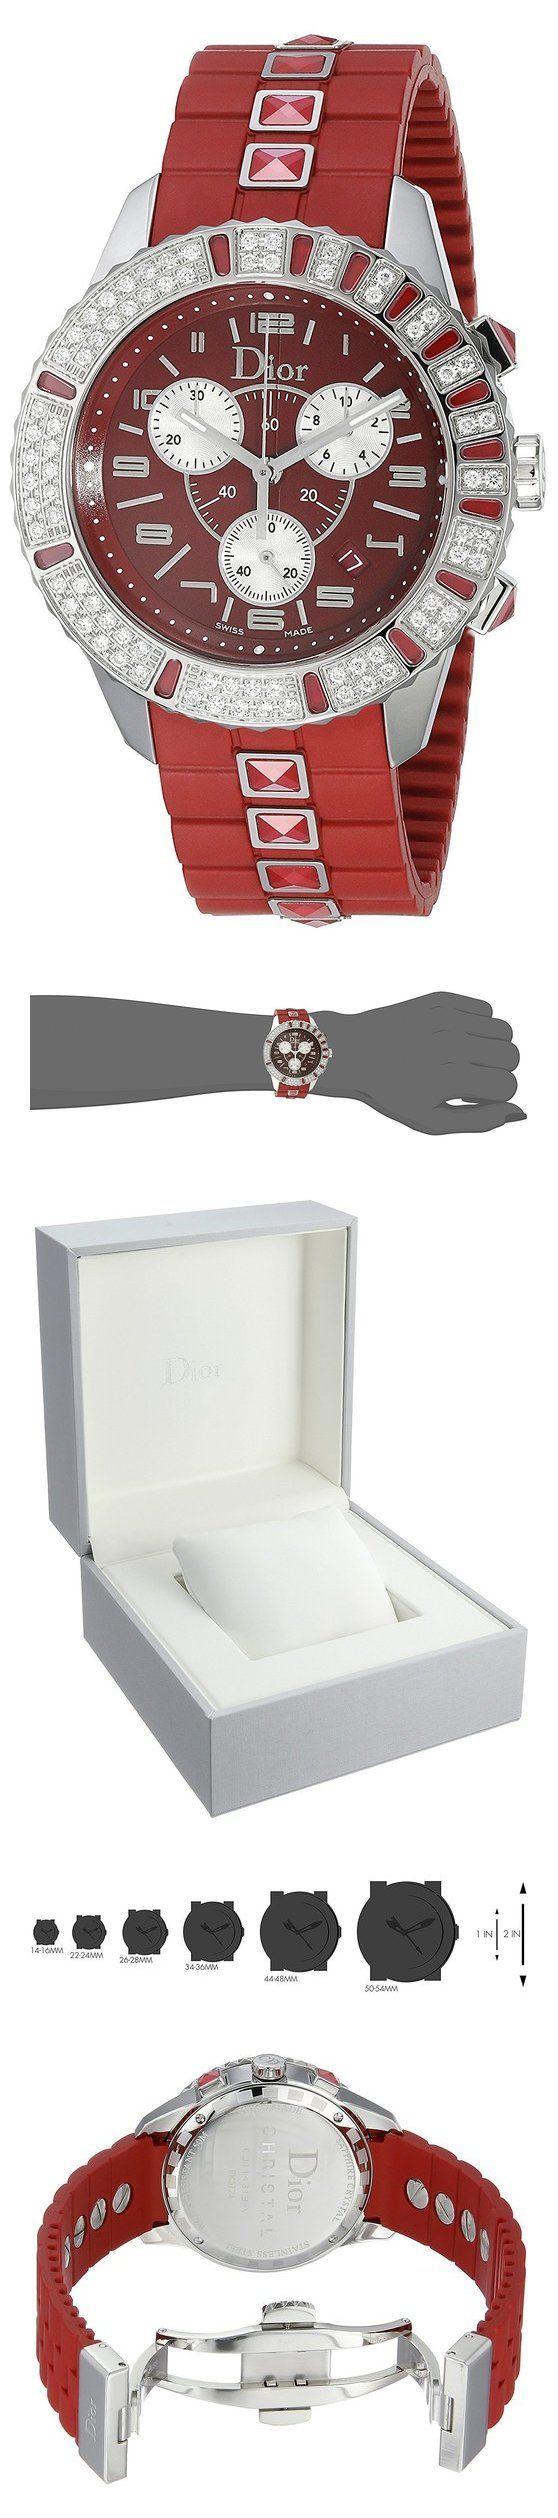 Christian Dior Women's CD11431BR001 Christal Chronograph Diamond Red Dial Watch #watch #christiandior #wrist_watches #watches #women #departments #shops